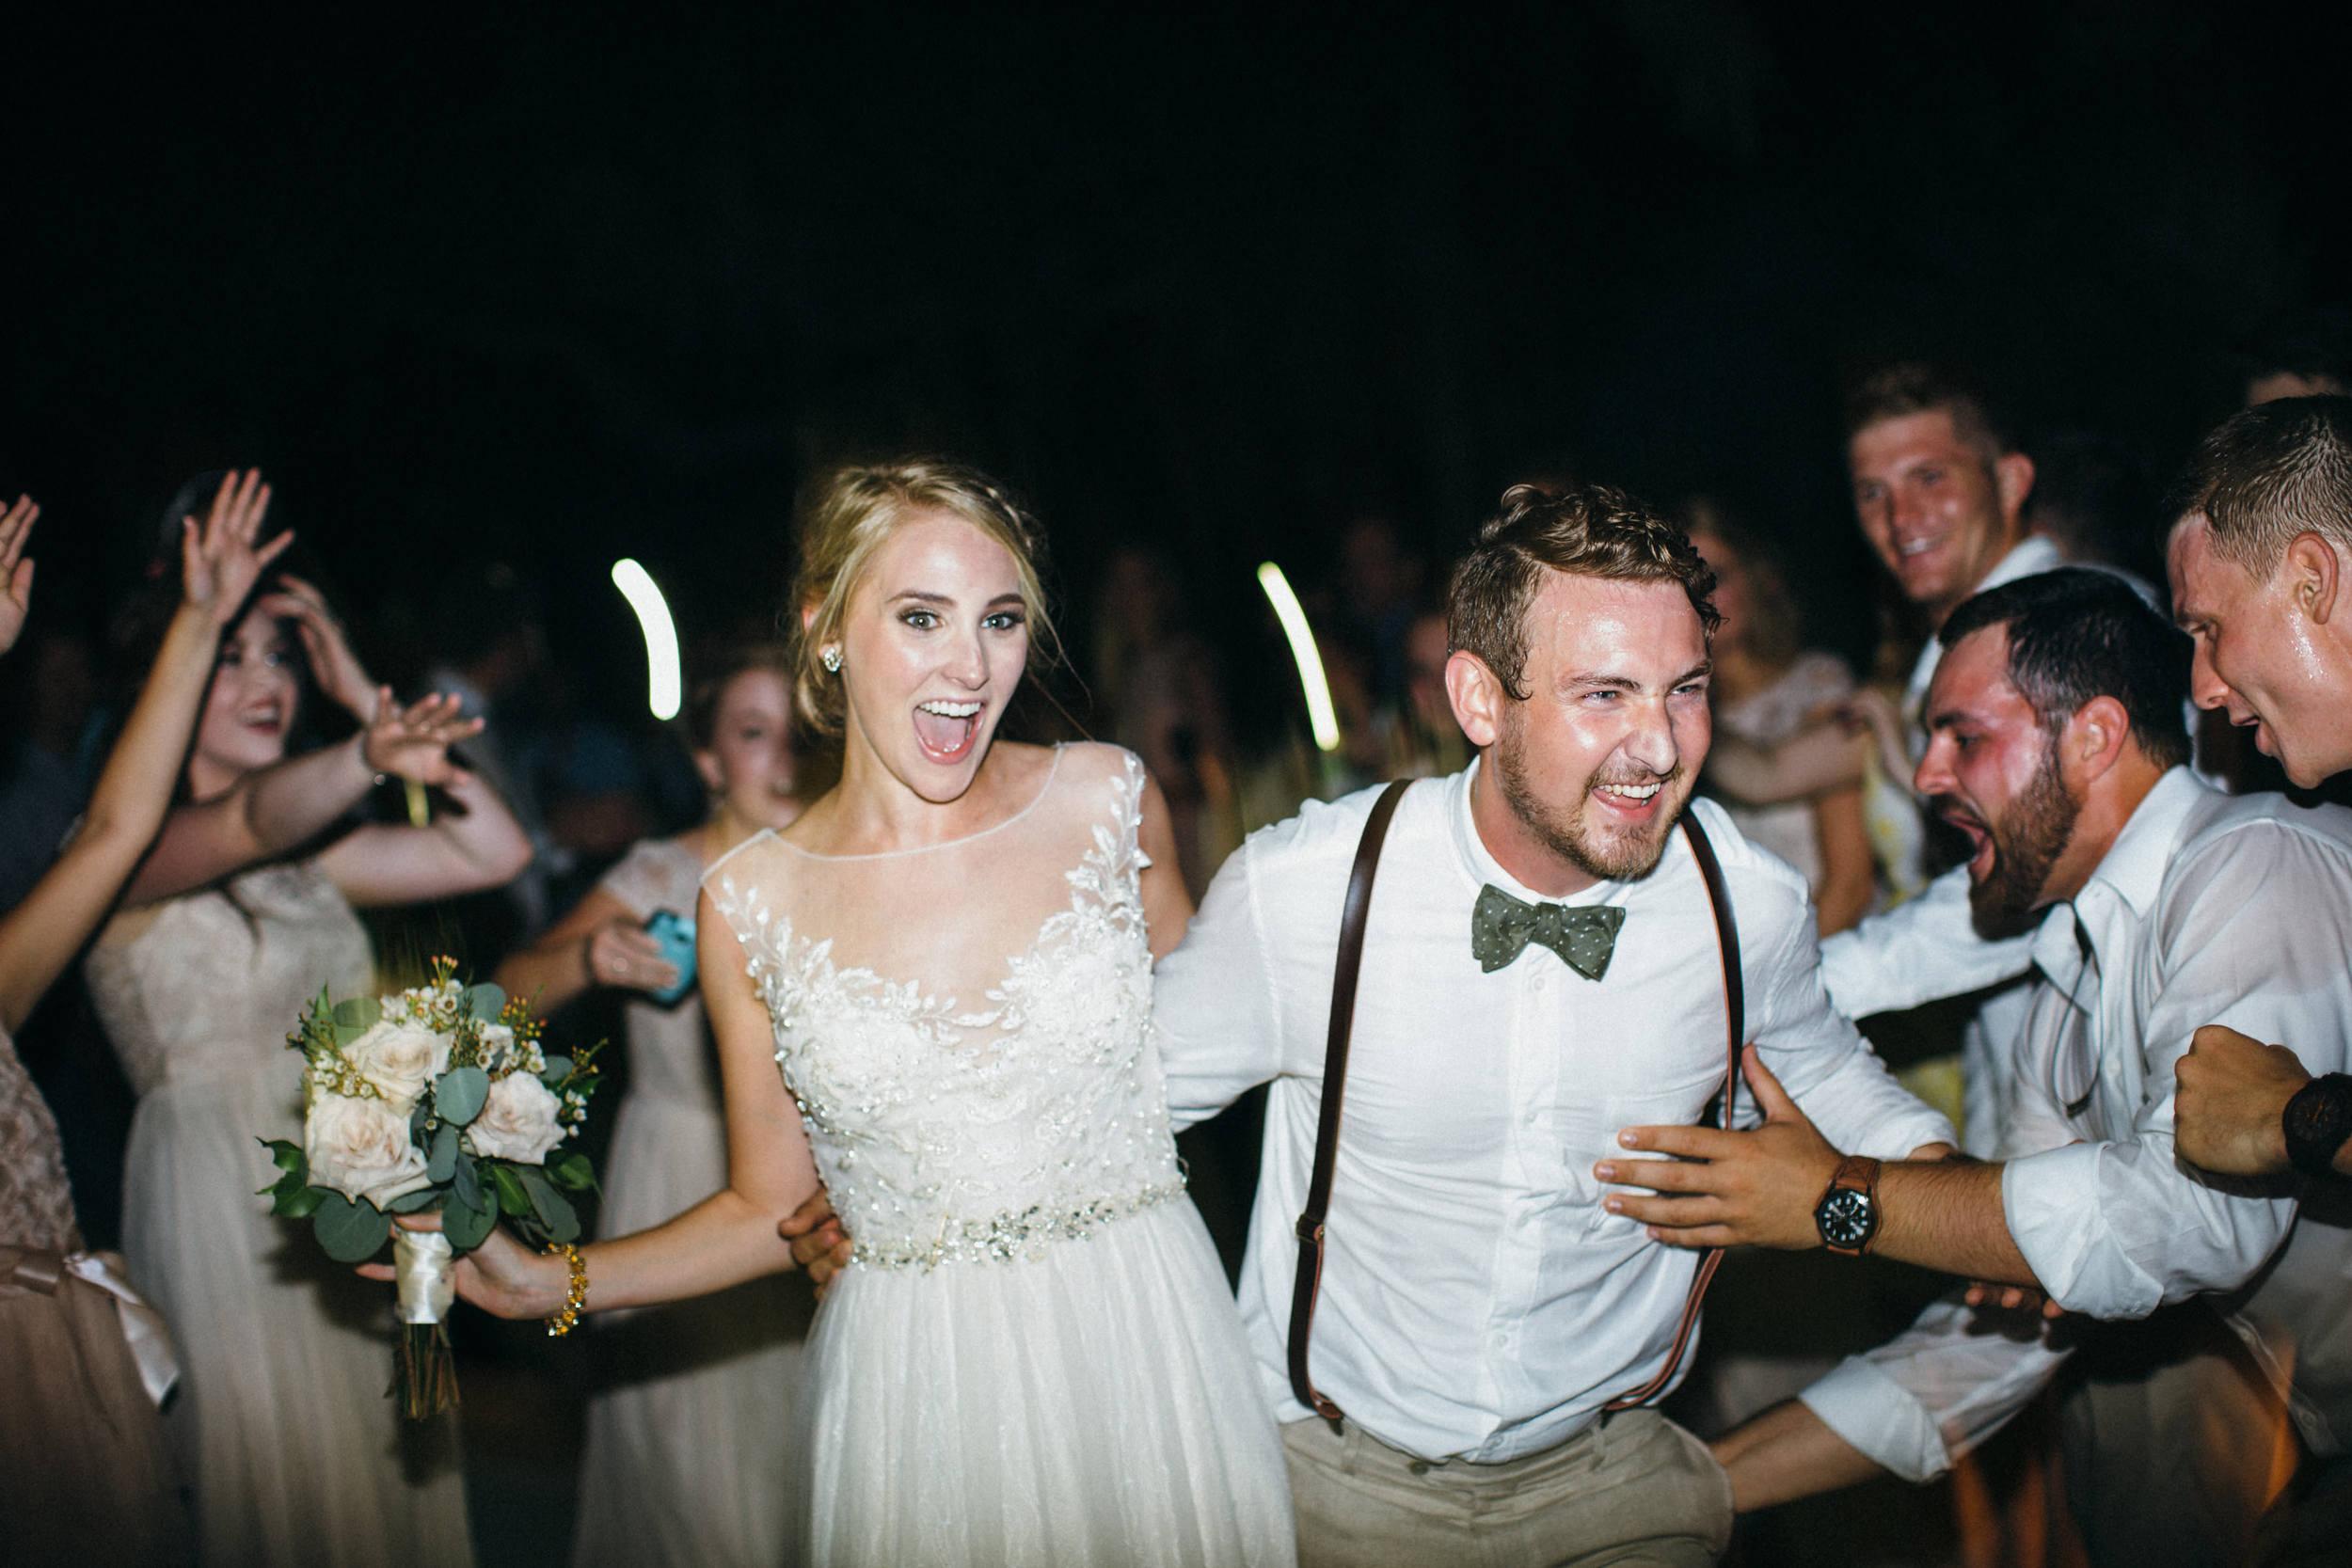 Holly & Caleb   Wedding   Powel Crosley Estate   Sarasota, Florida   Benjamin Hewitt Photography